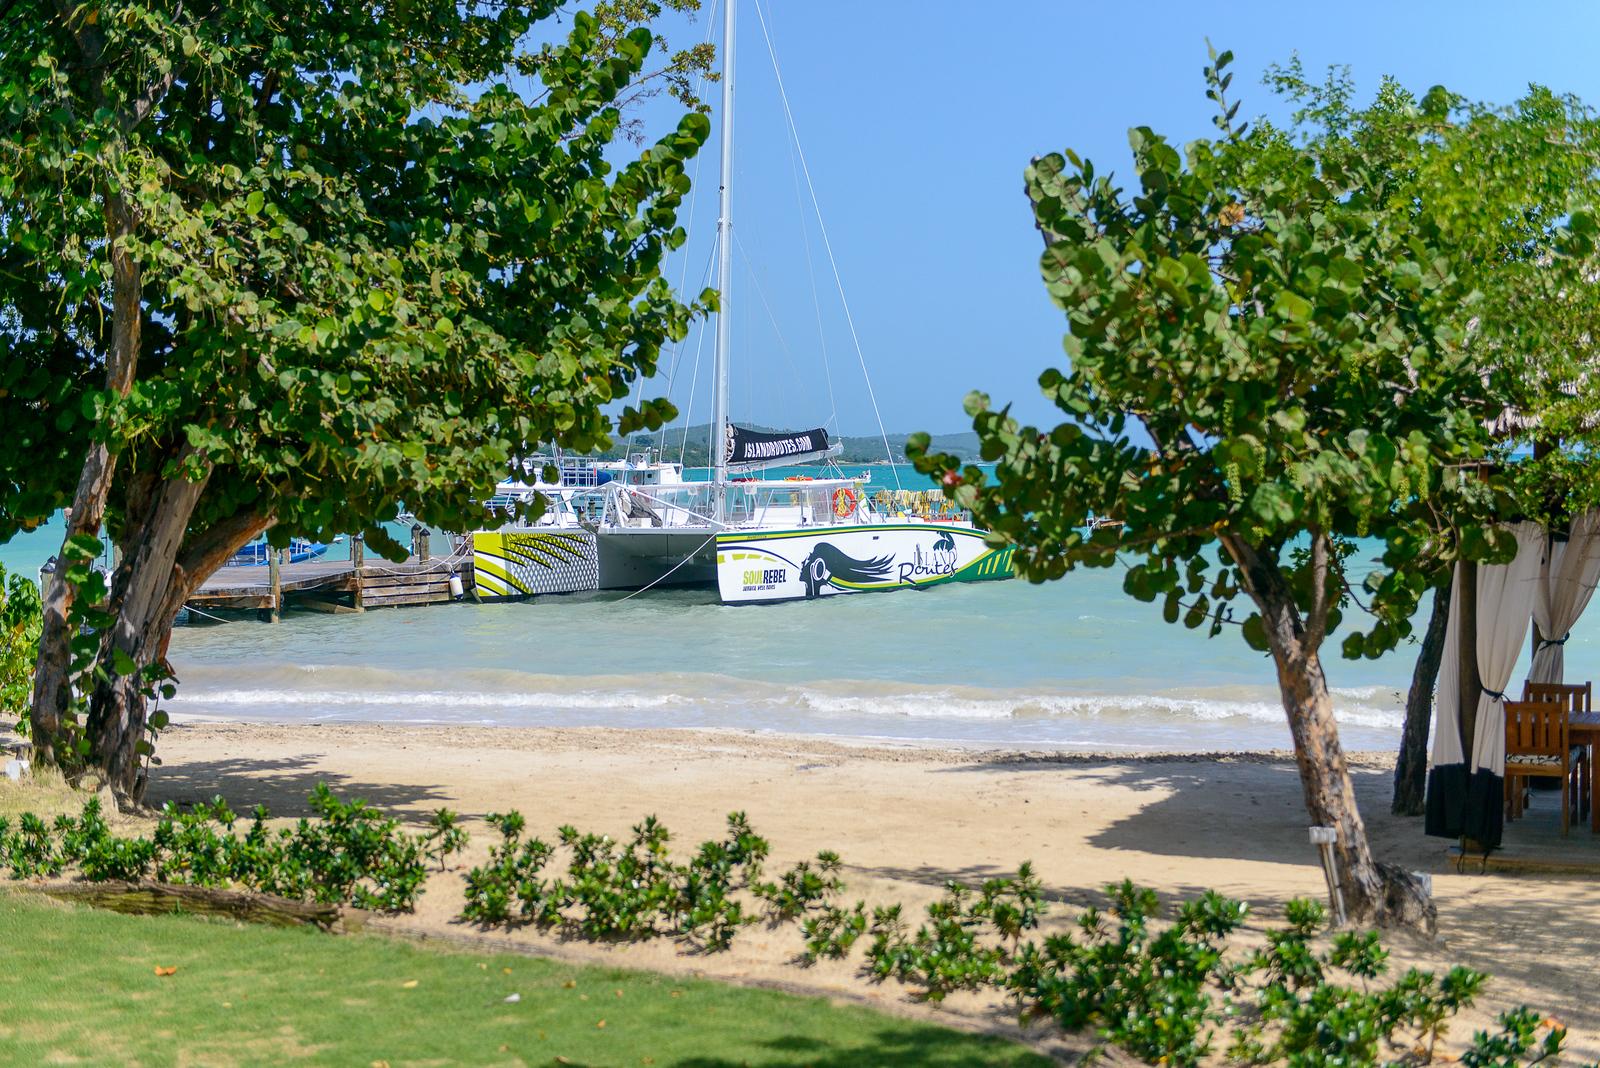 Island Routes catamaran